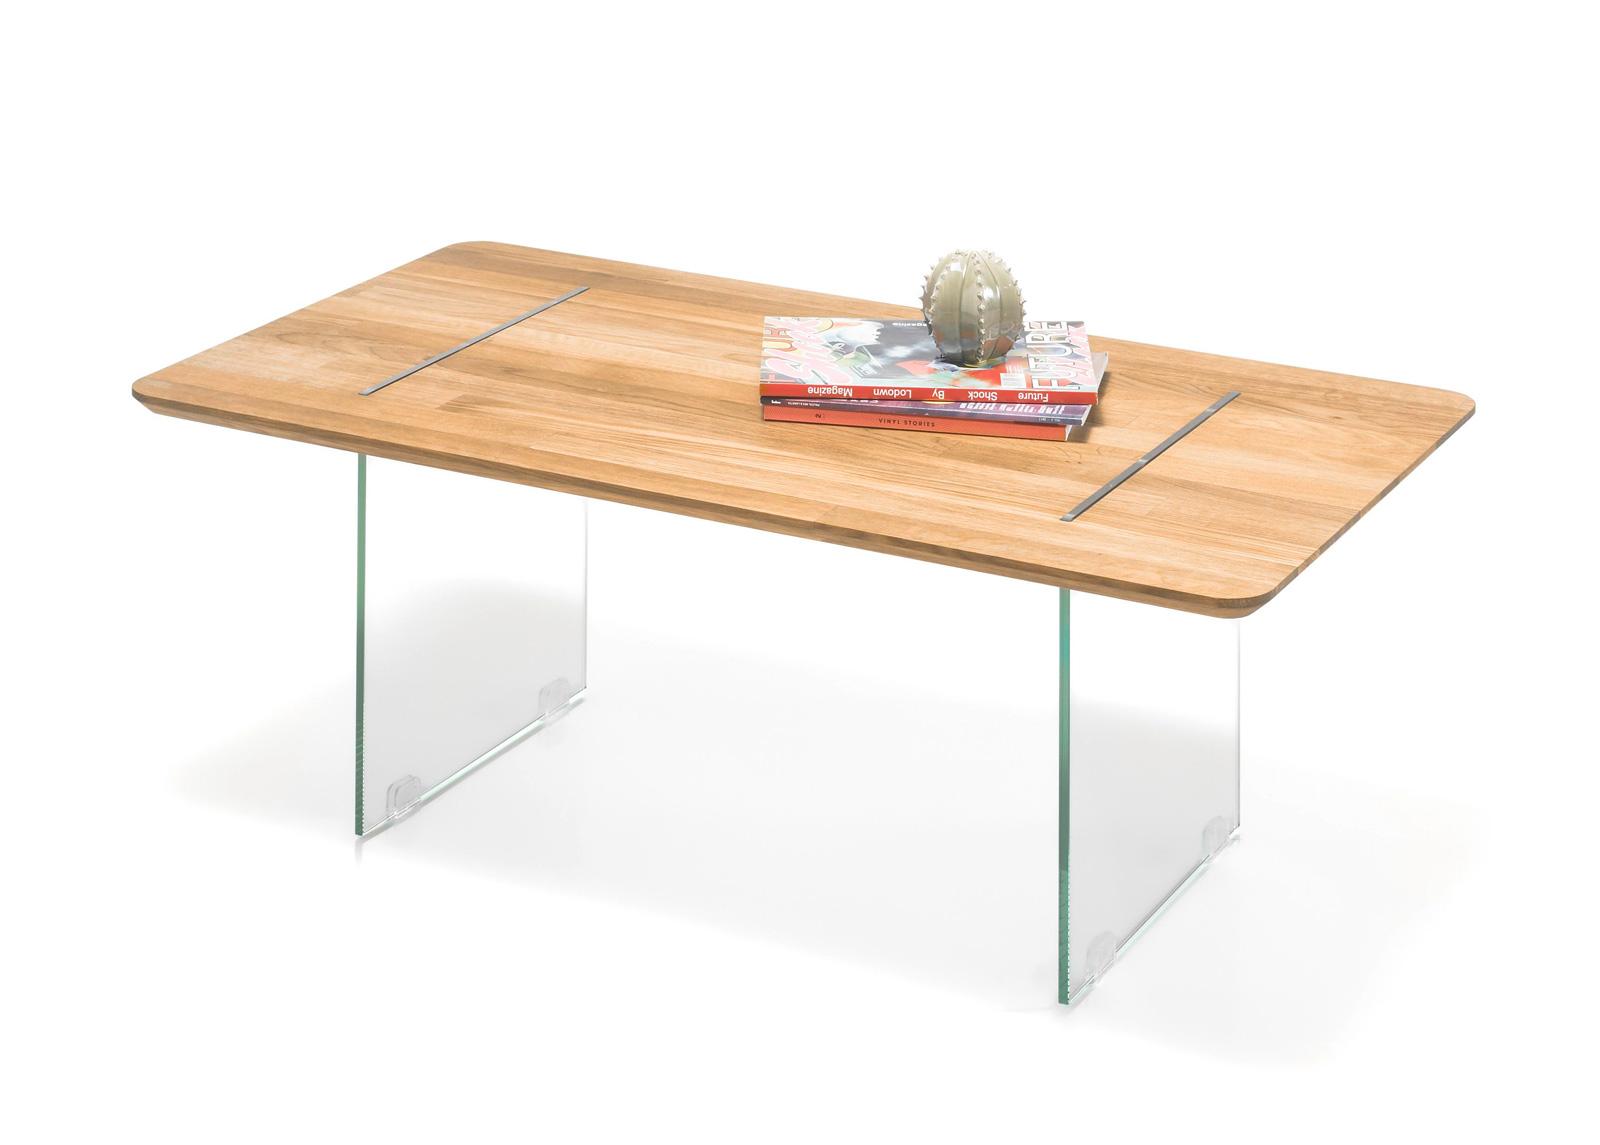 Sohvapöytä tammea Lausenne Montreal 110x60 cm